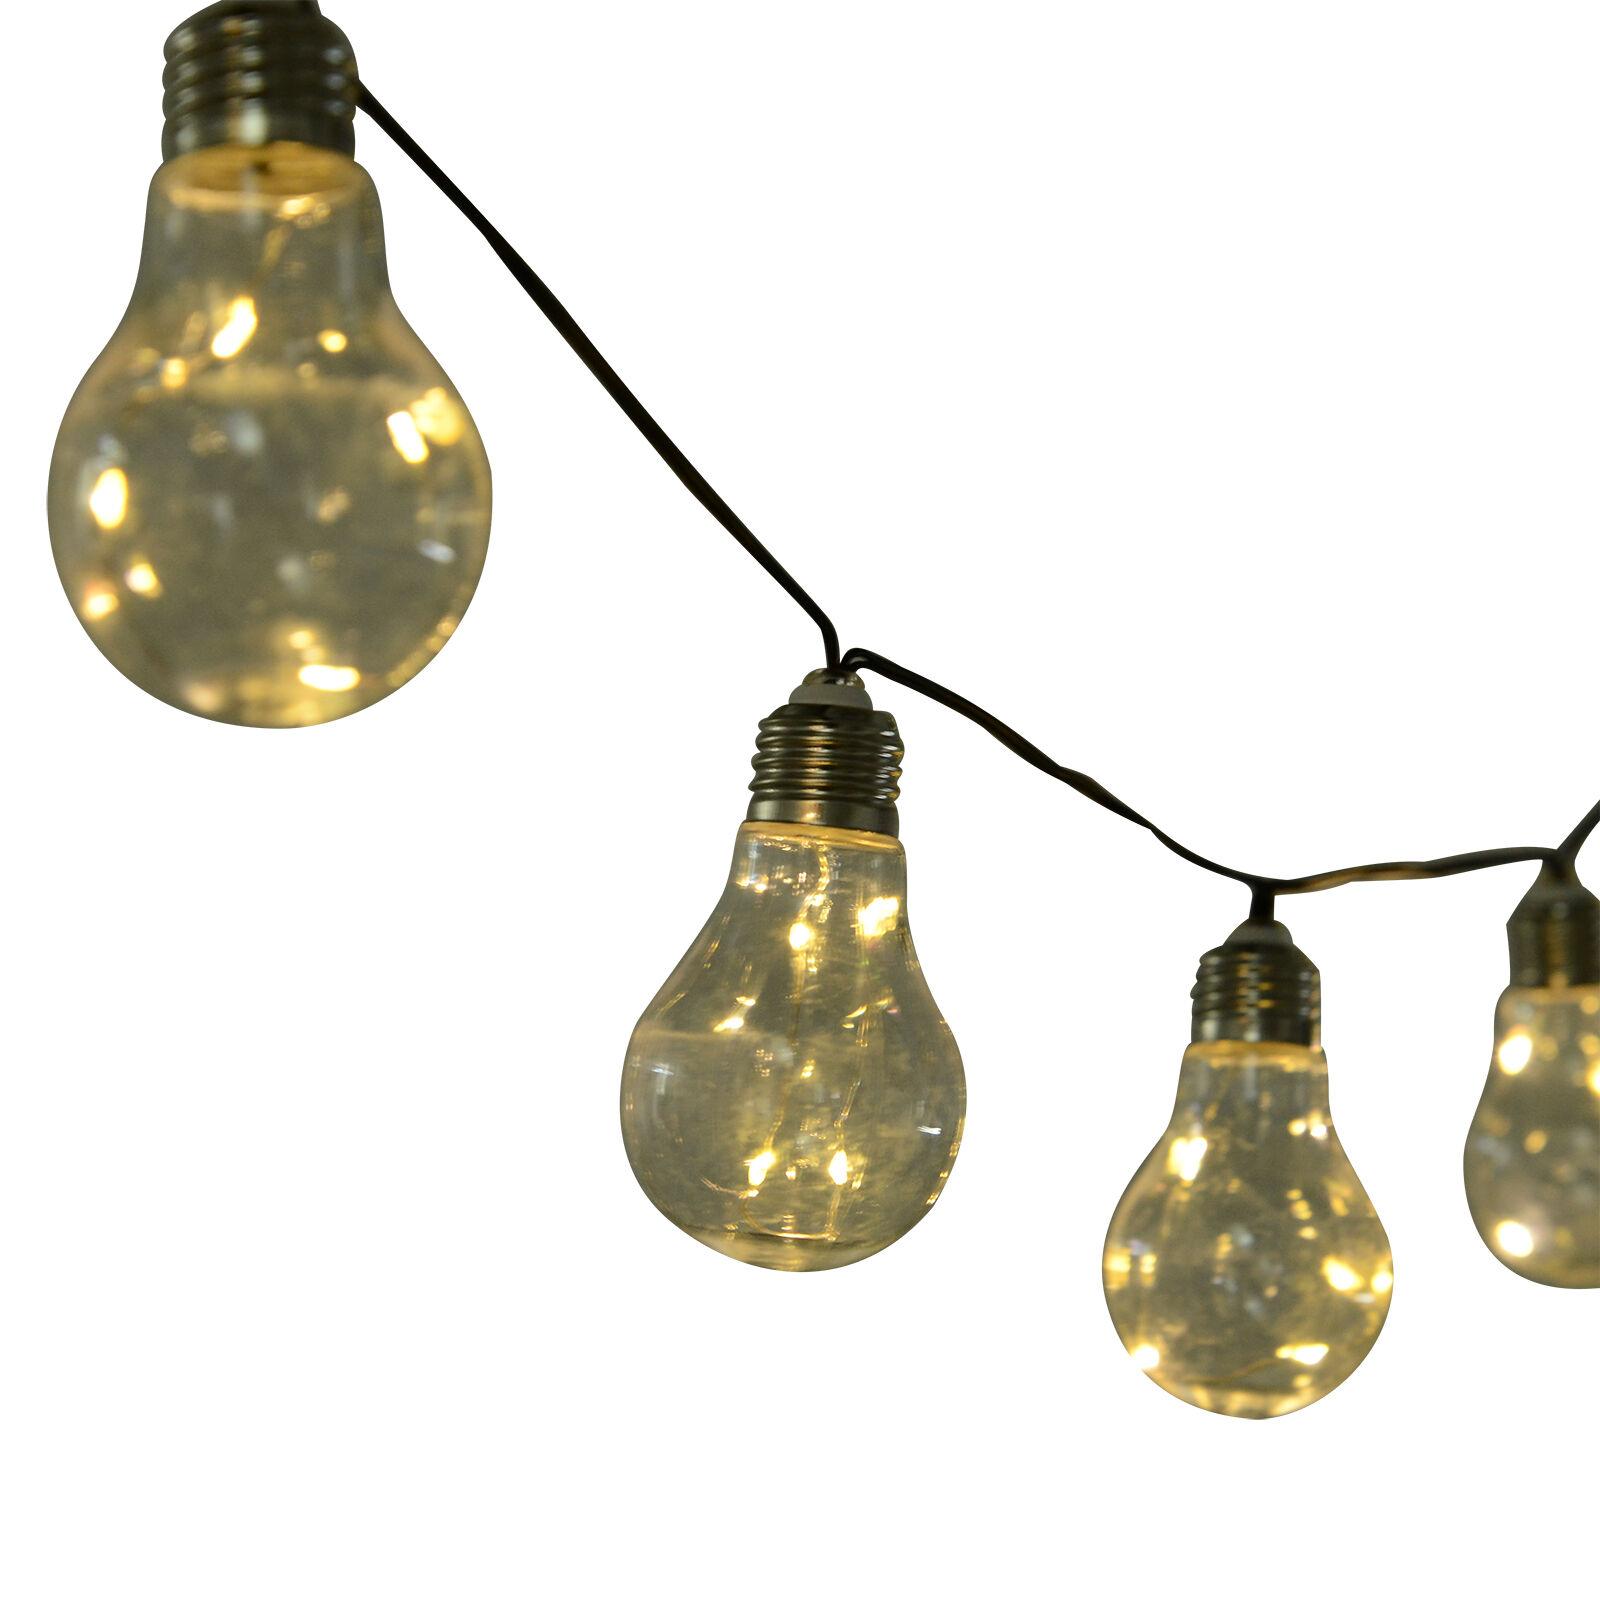 Outsunny Guirlandes LED solaires 20 ampoules 7,6 m